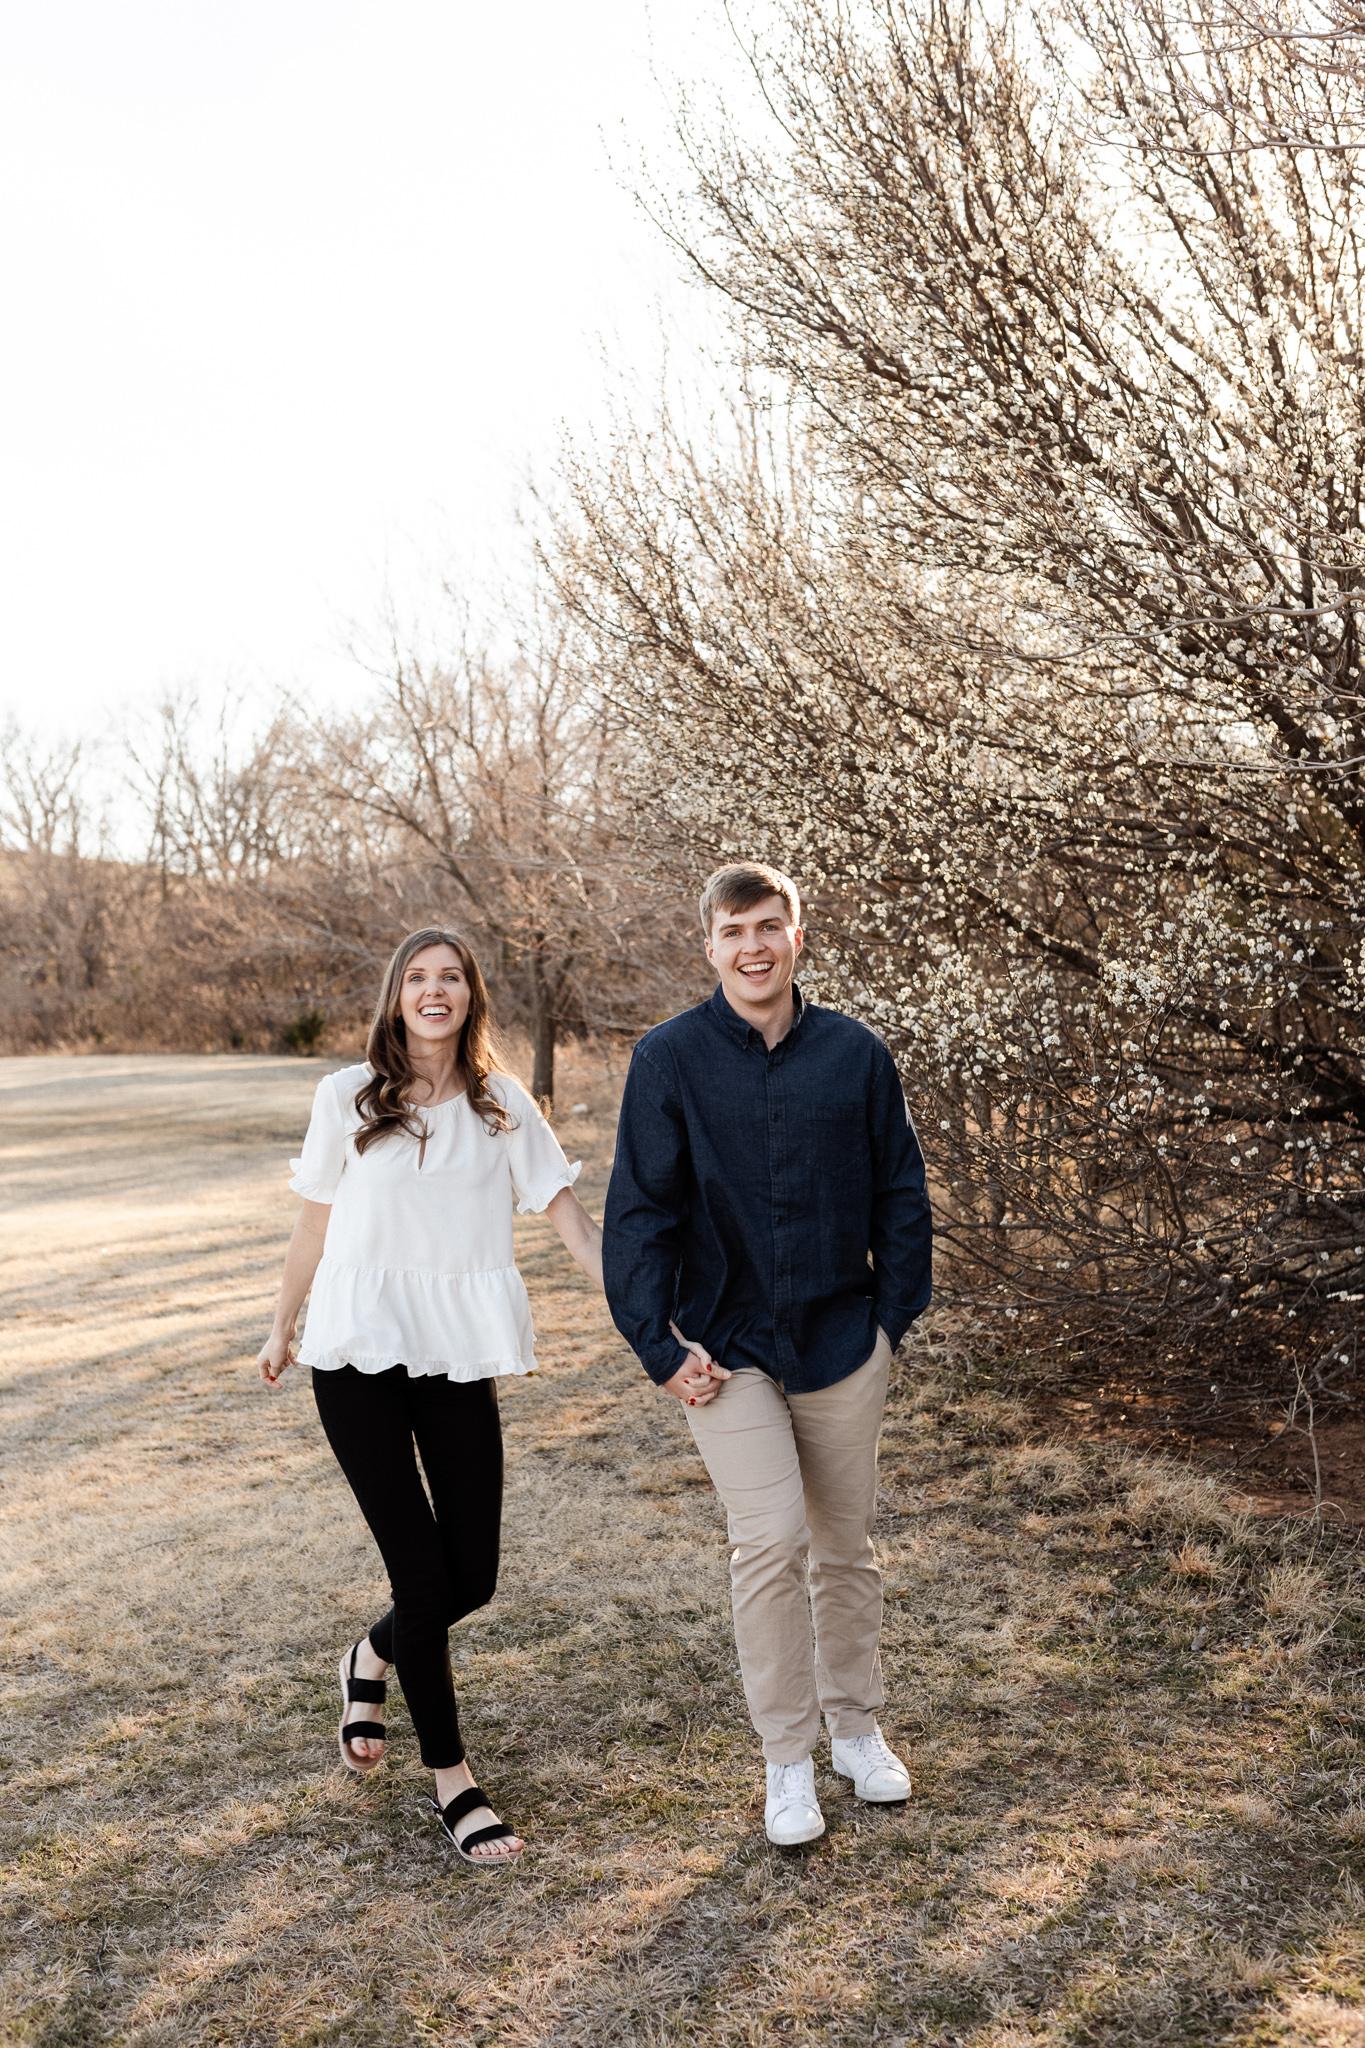 Browne | Timeless Downtown Engagements | Oklahoma Wedding Photographer-12.jpg